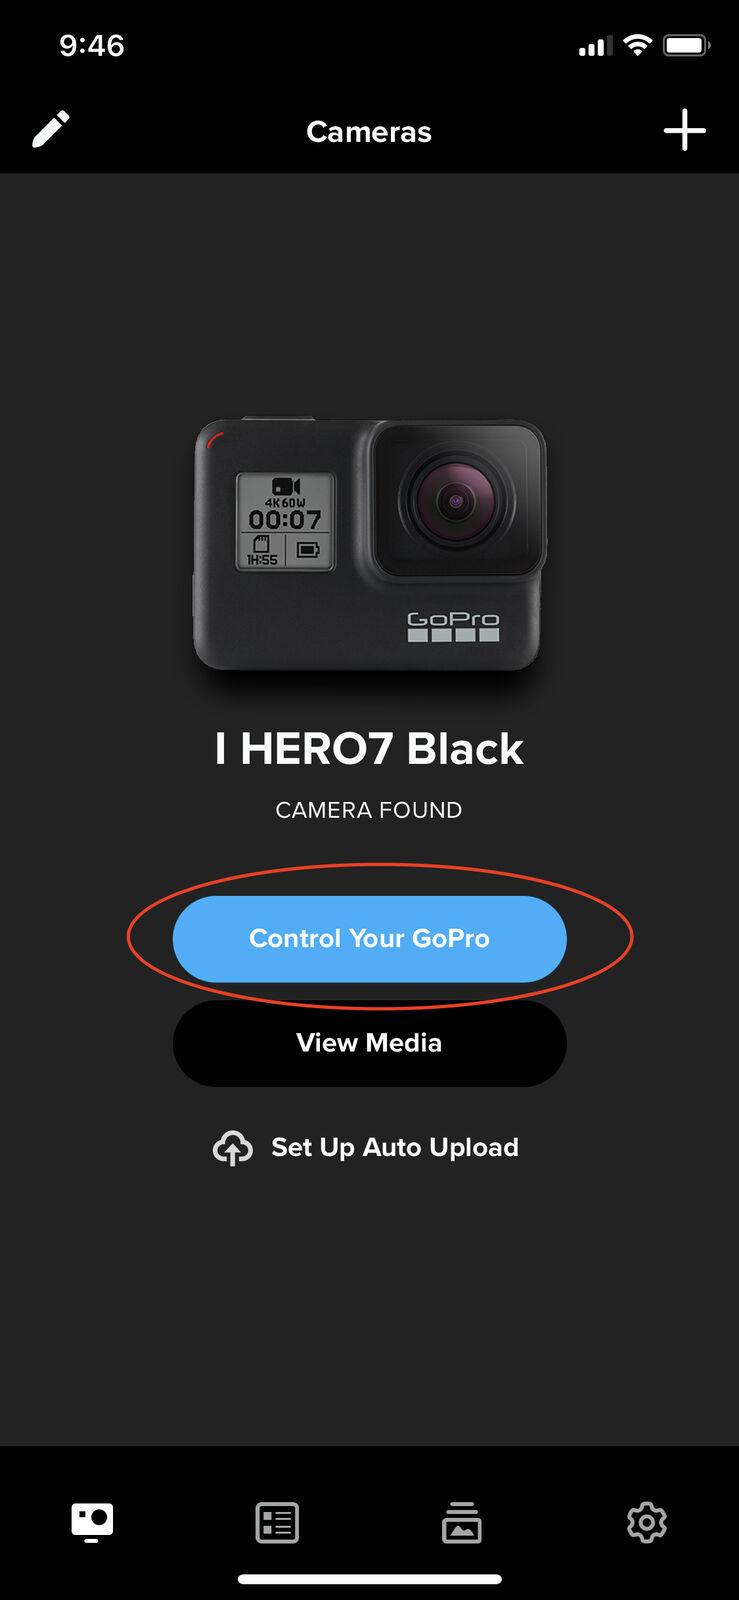 GoPro control